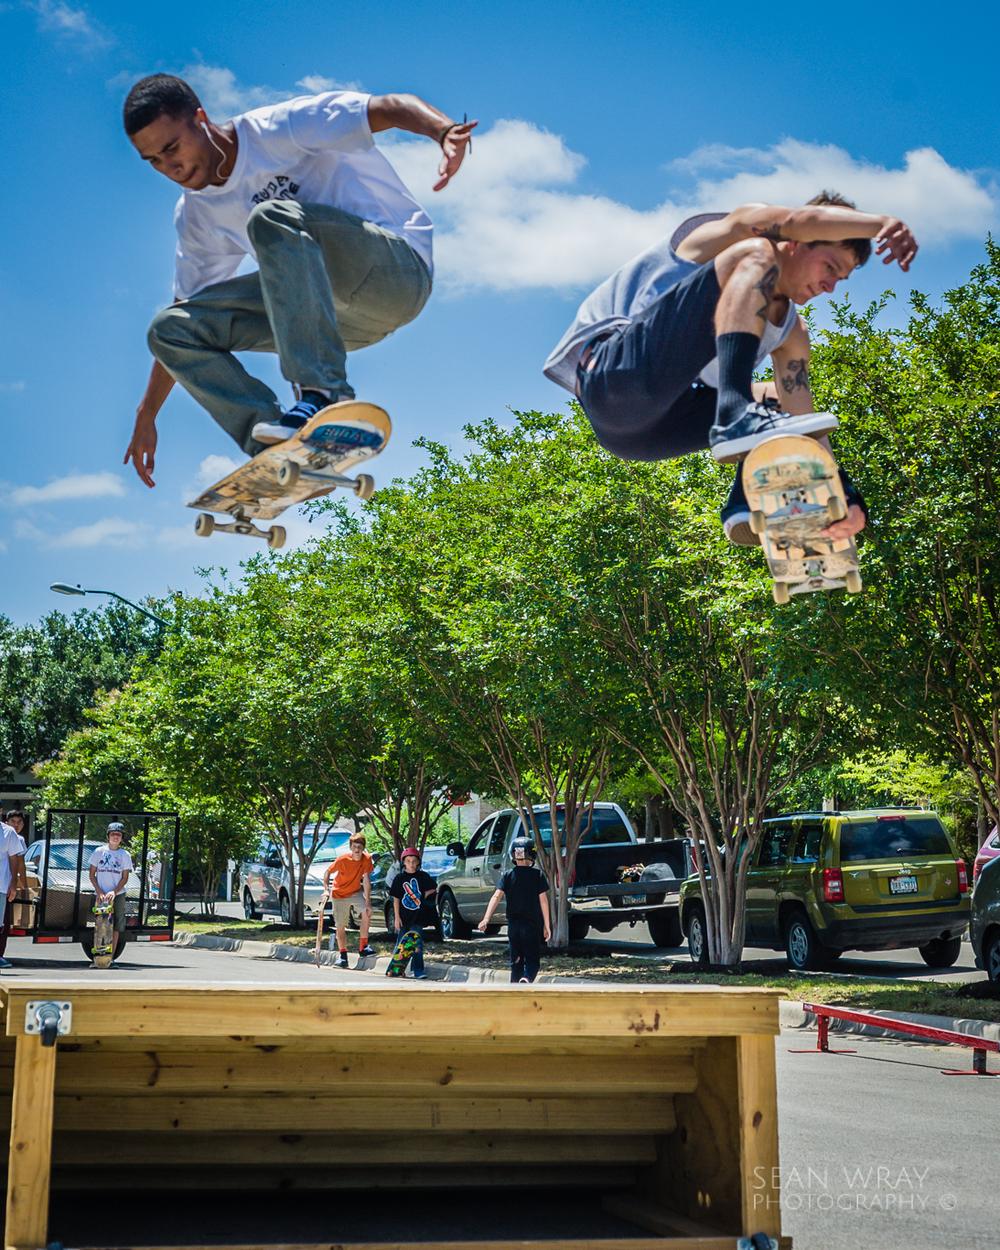 20140518_Skateboard_0003.jpg